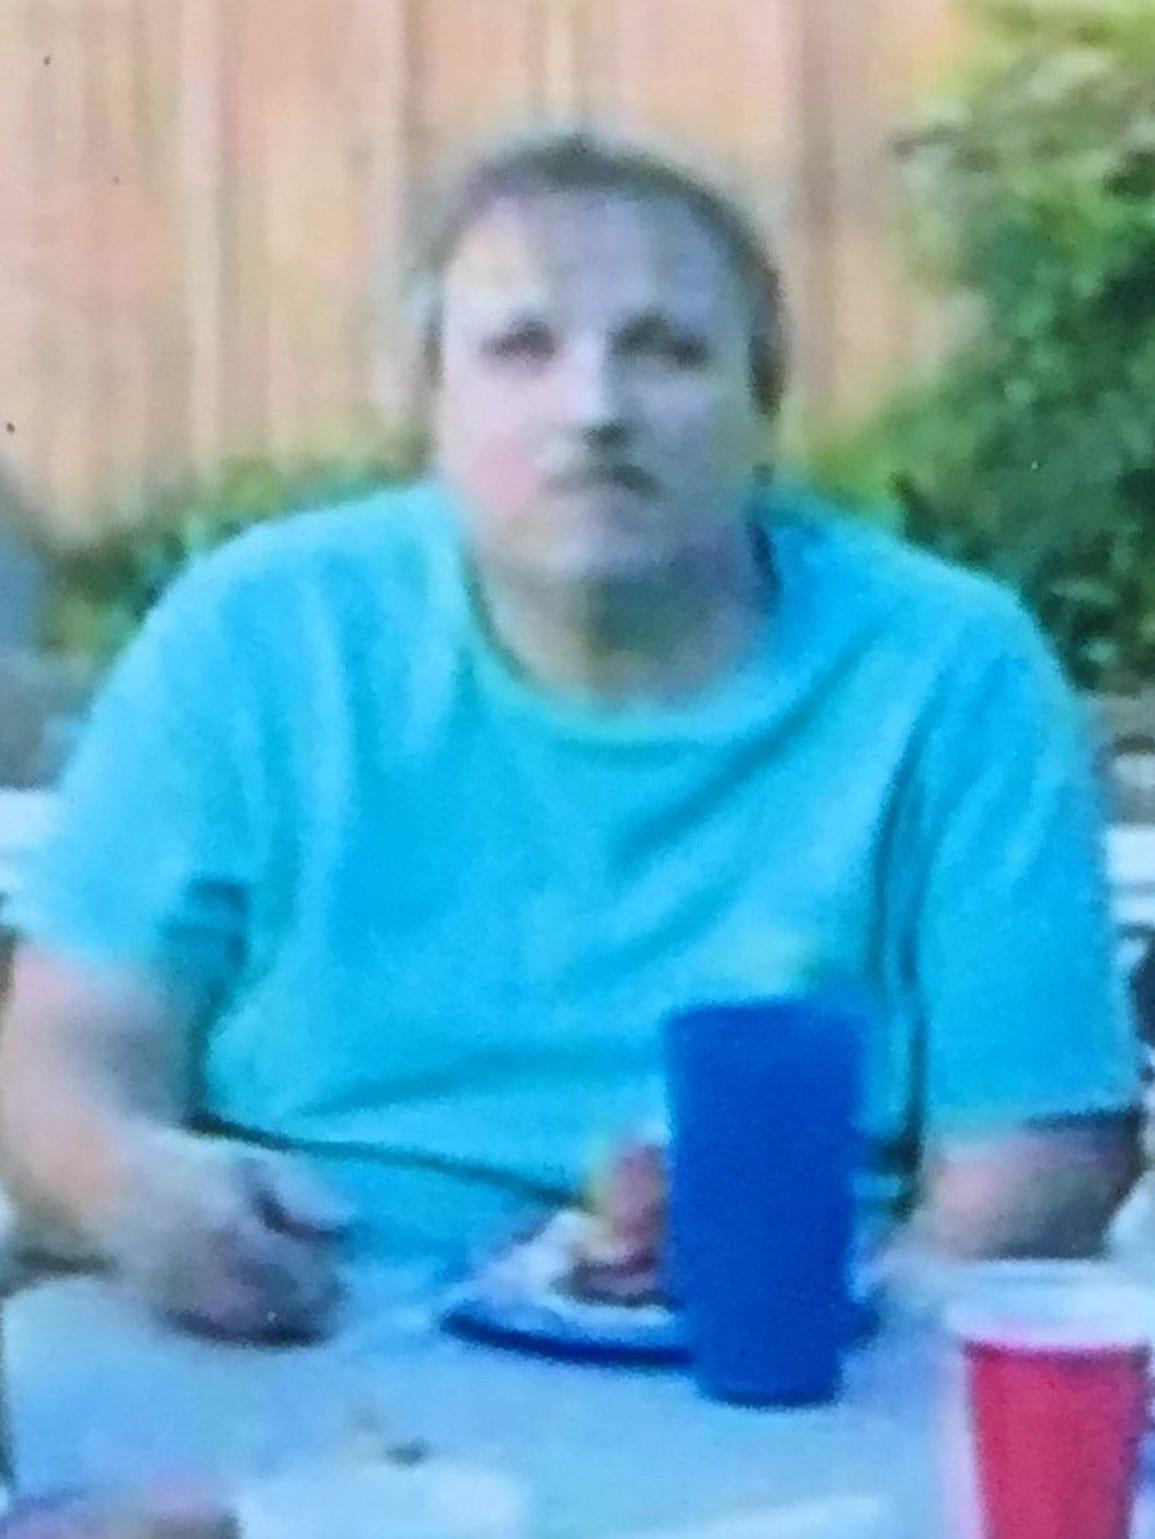 Billy Seigler, whose pelvis was broken in an attempted